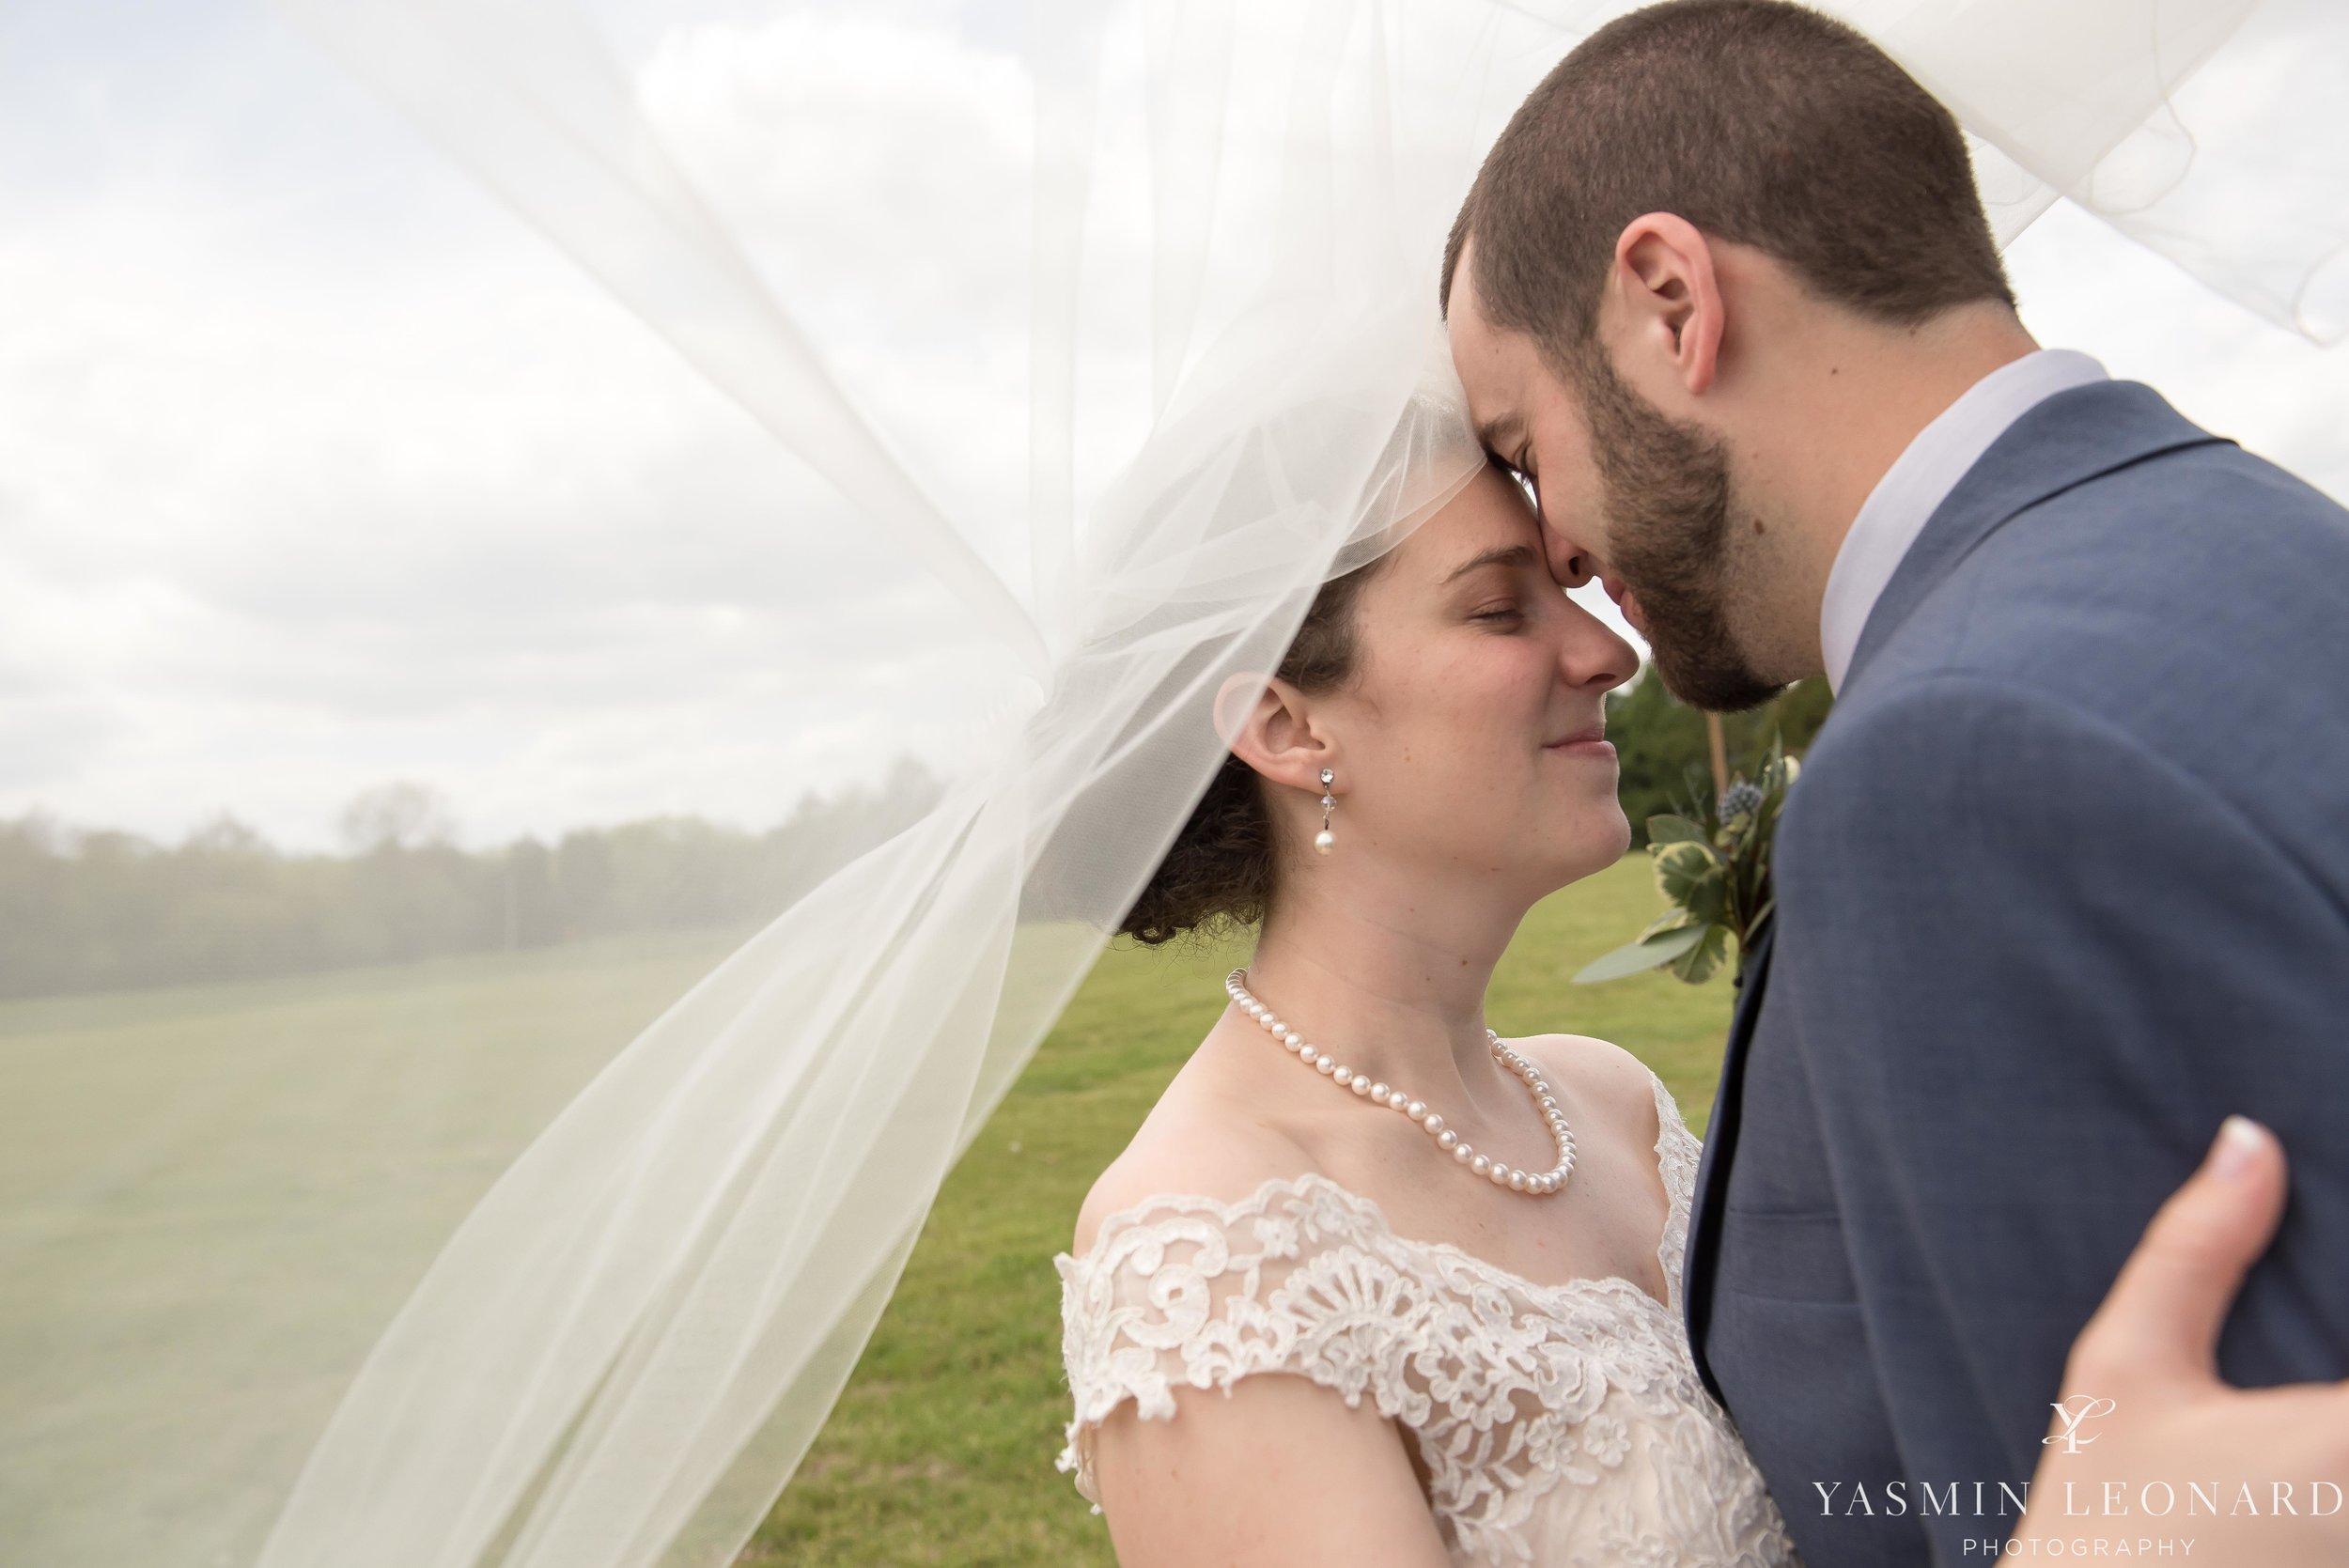 Courtney and Justin - L'abri at Linwood - Yasmin Leonard Photography-47.jpg